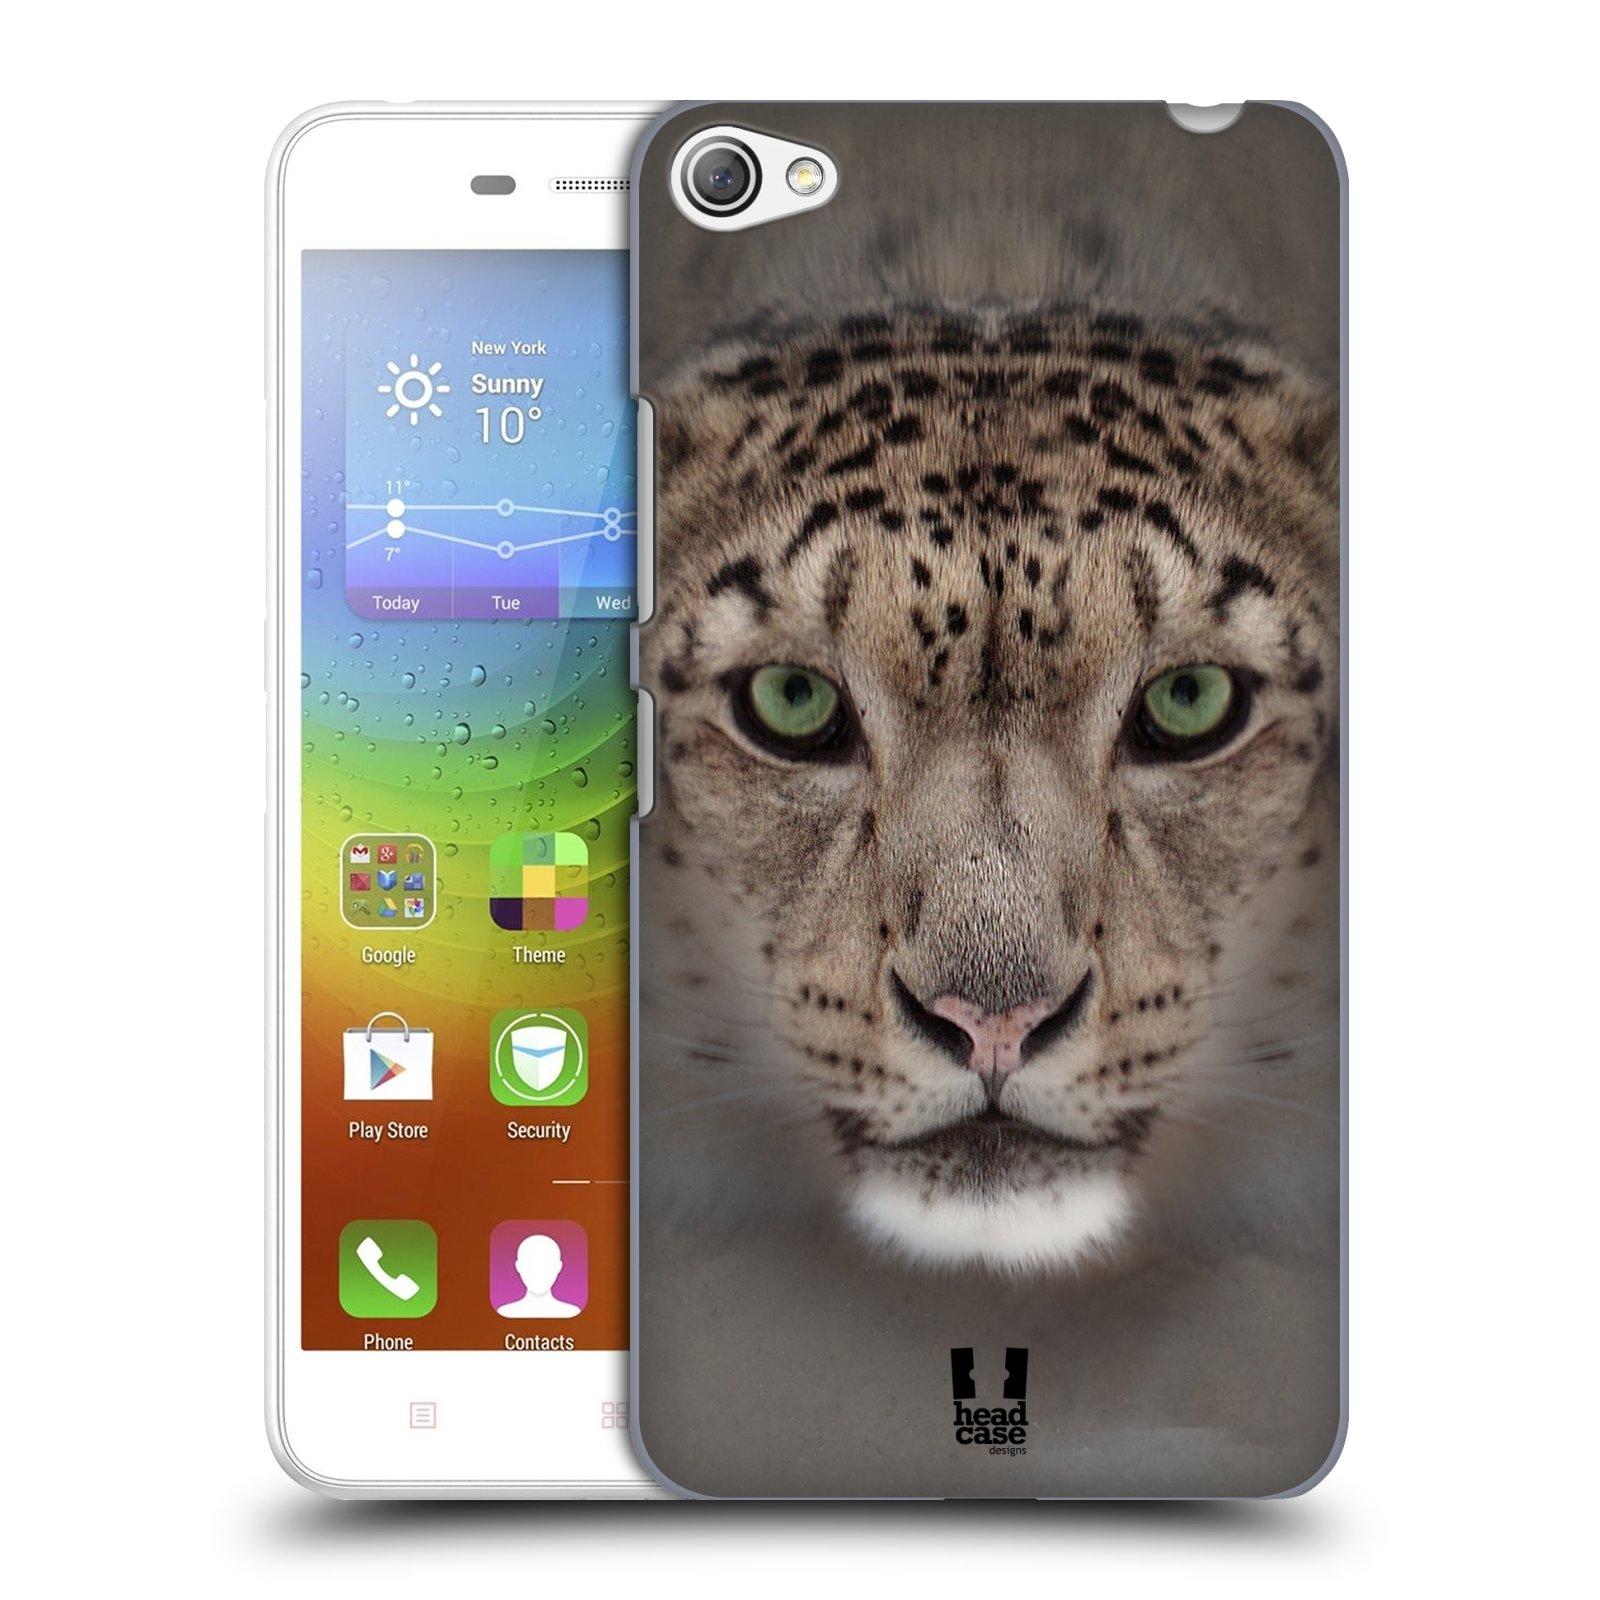 HEAD CASE pevný plastový obal na mobil LENOVO S60 / LENOVO S60 DUAL SIM vzor Zvířecí tváře 2 sněžný leopard